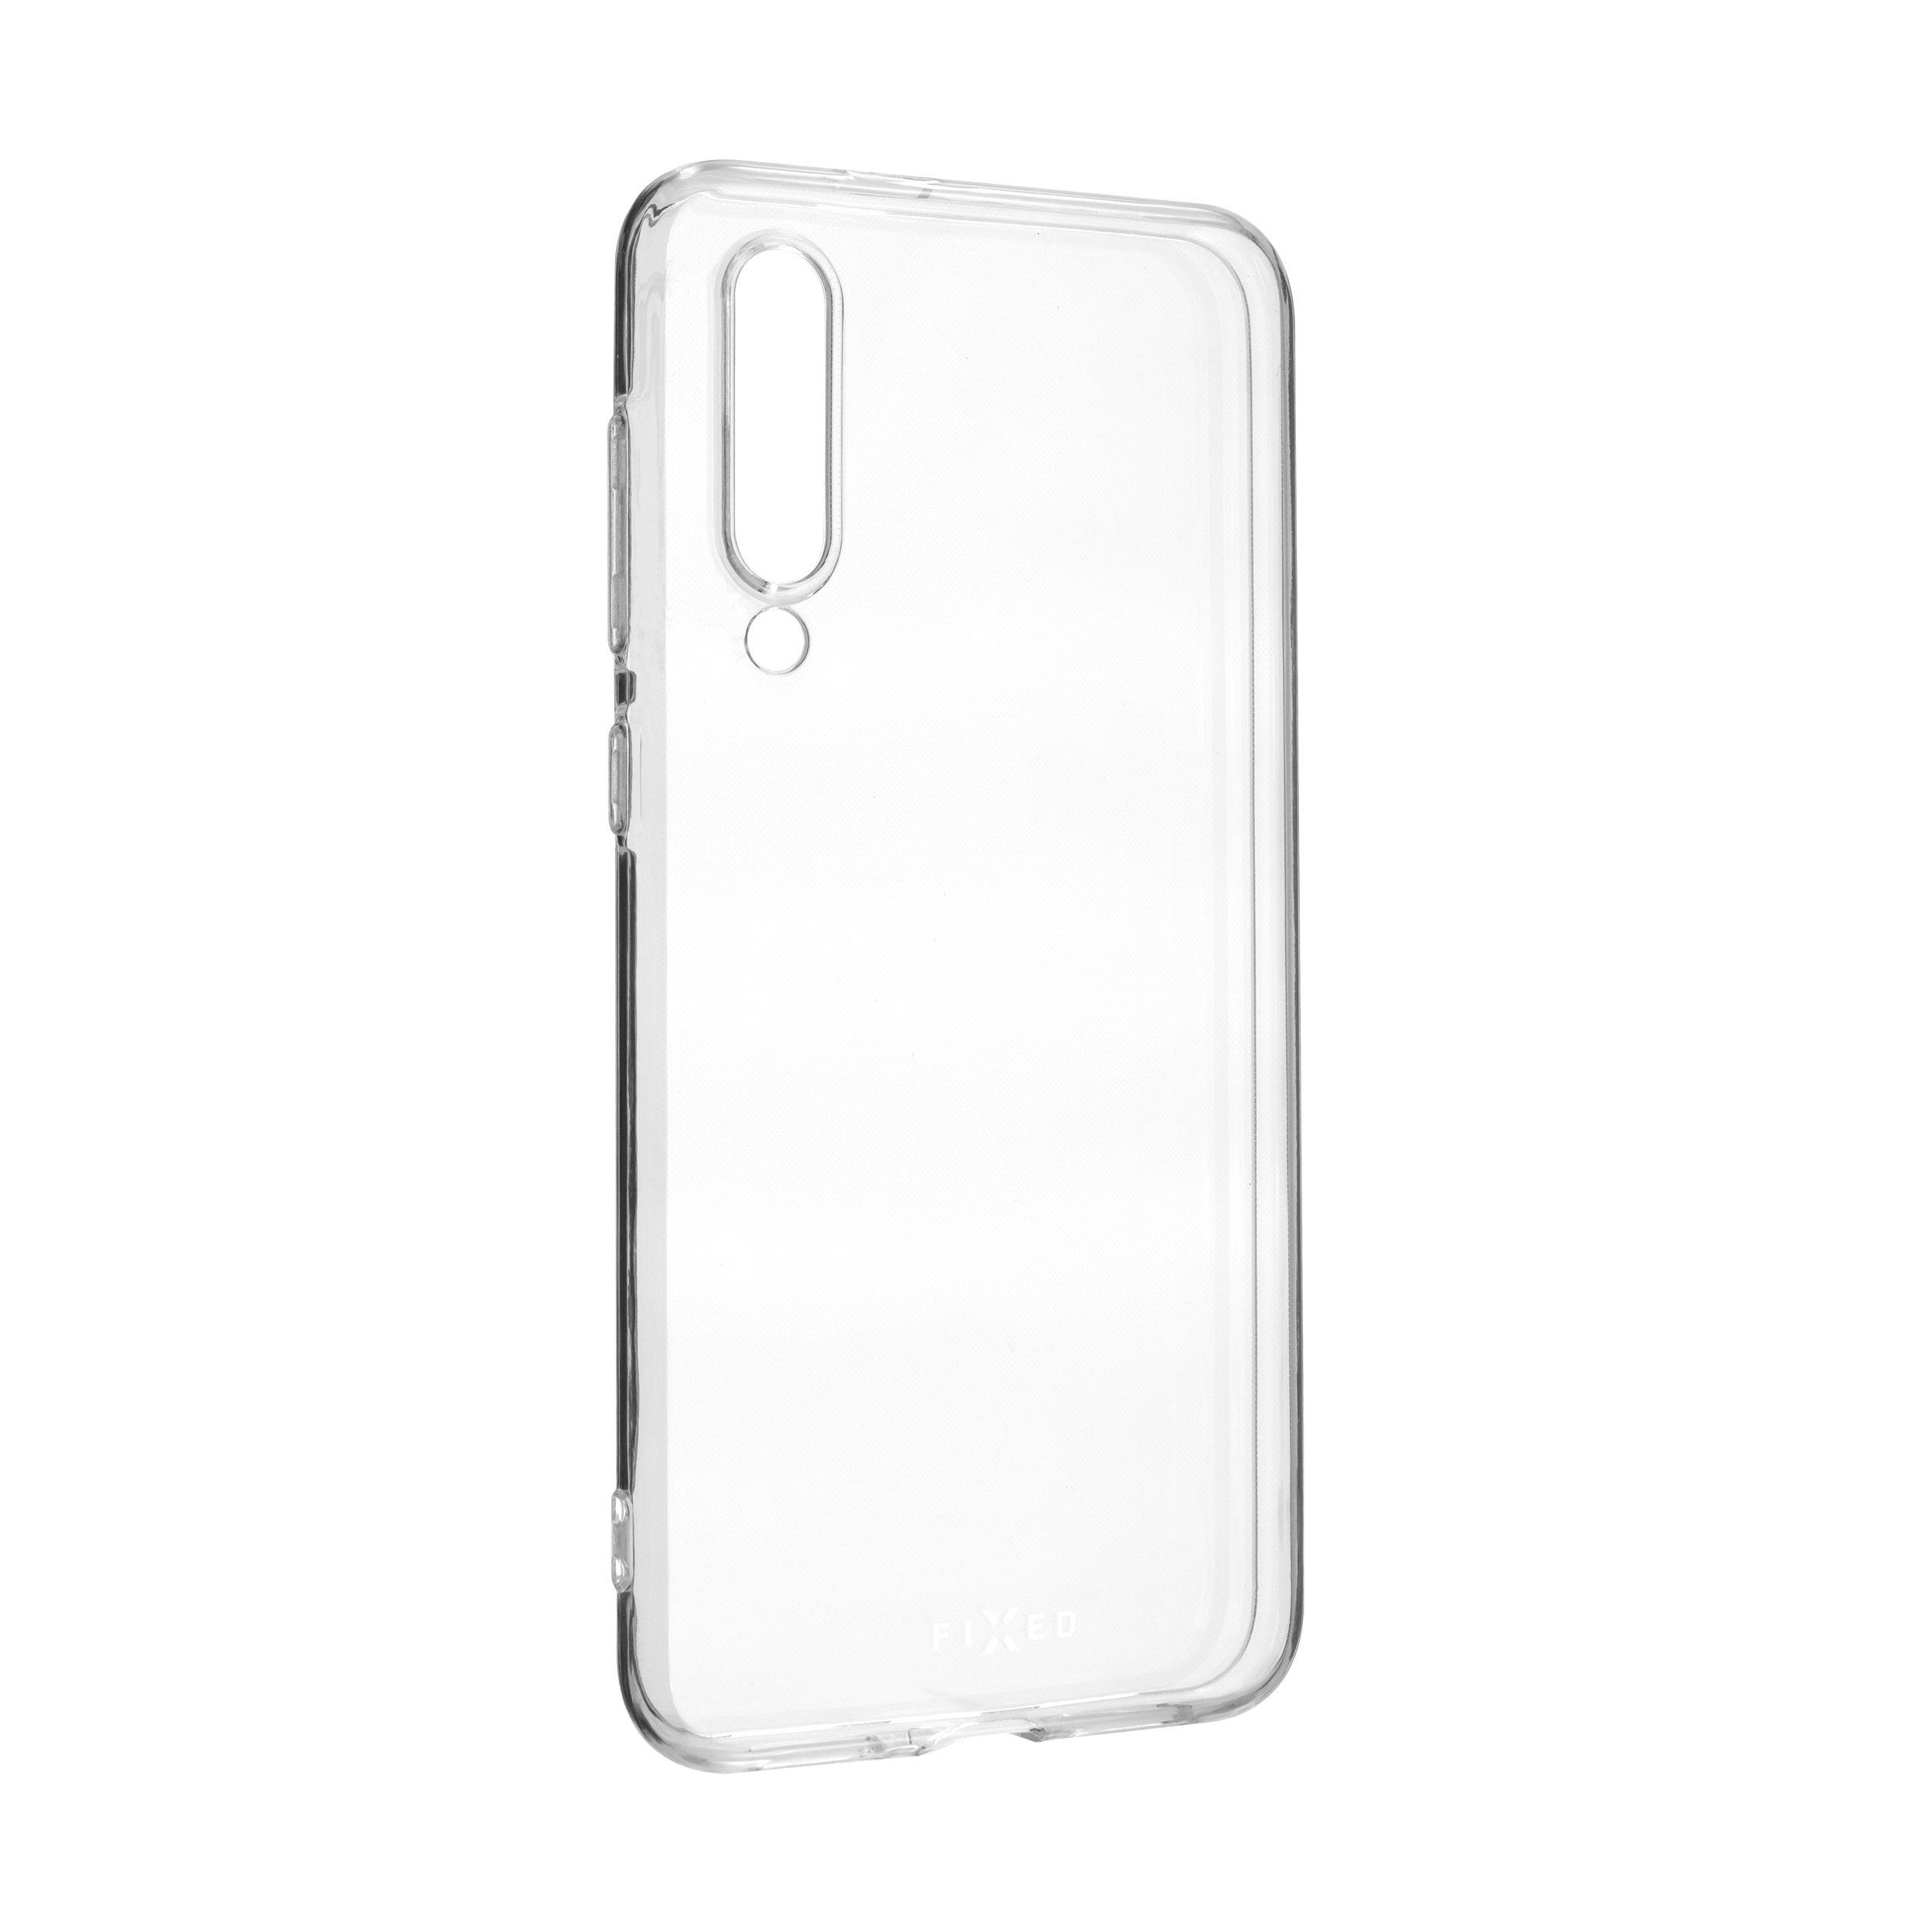 Ultratenké TPU gelové pouzdro FIXED Skin pro Xiaomi Mi9 SE, 0,6 mm, čiré